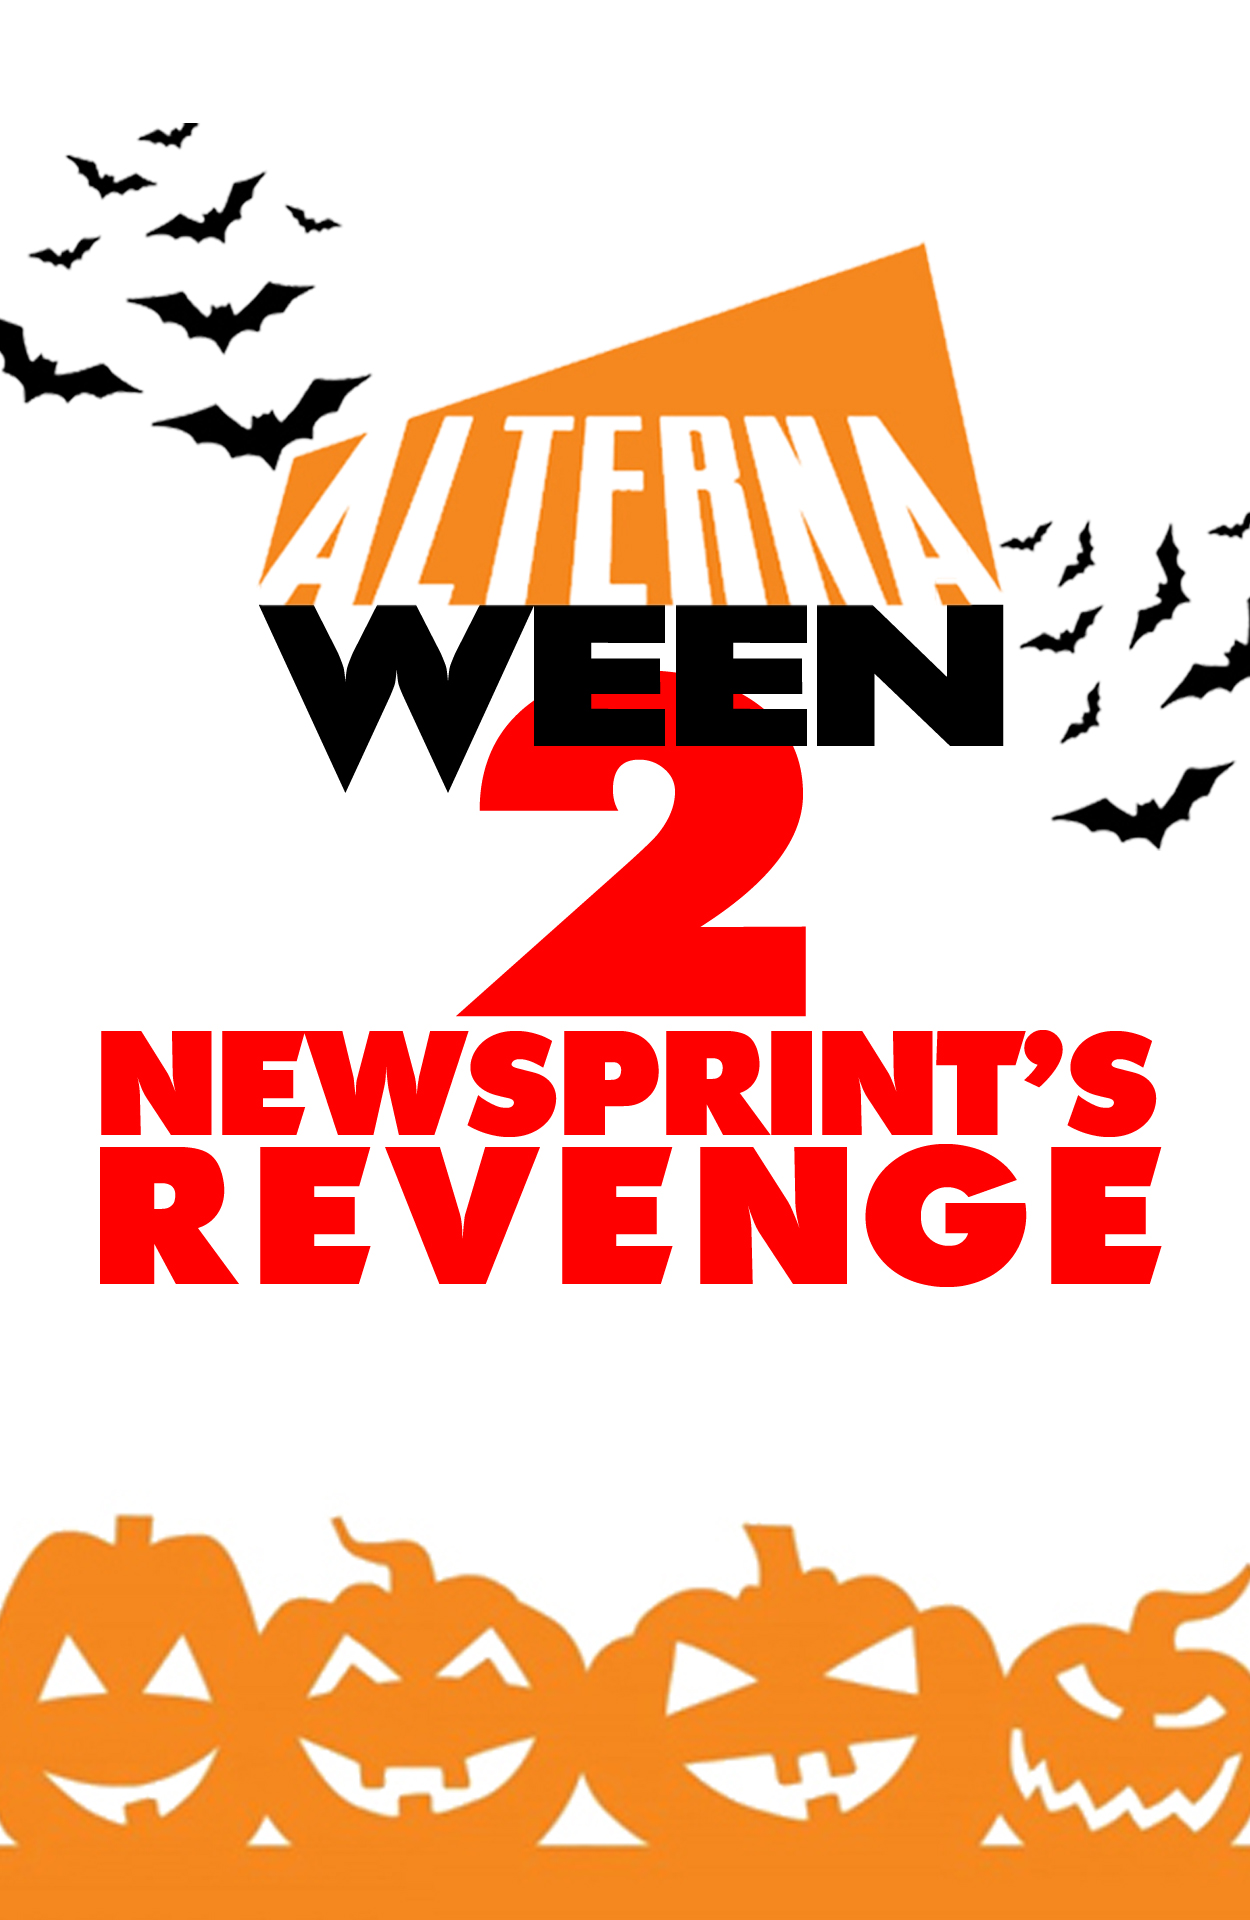 AlternaWeen 2: Newsprint's Revenge